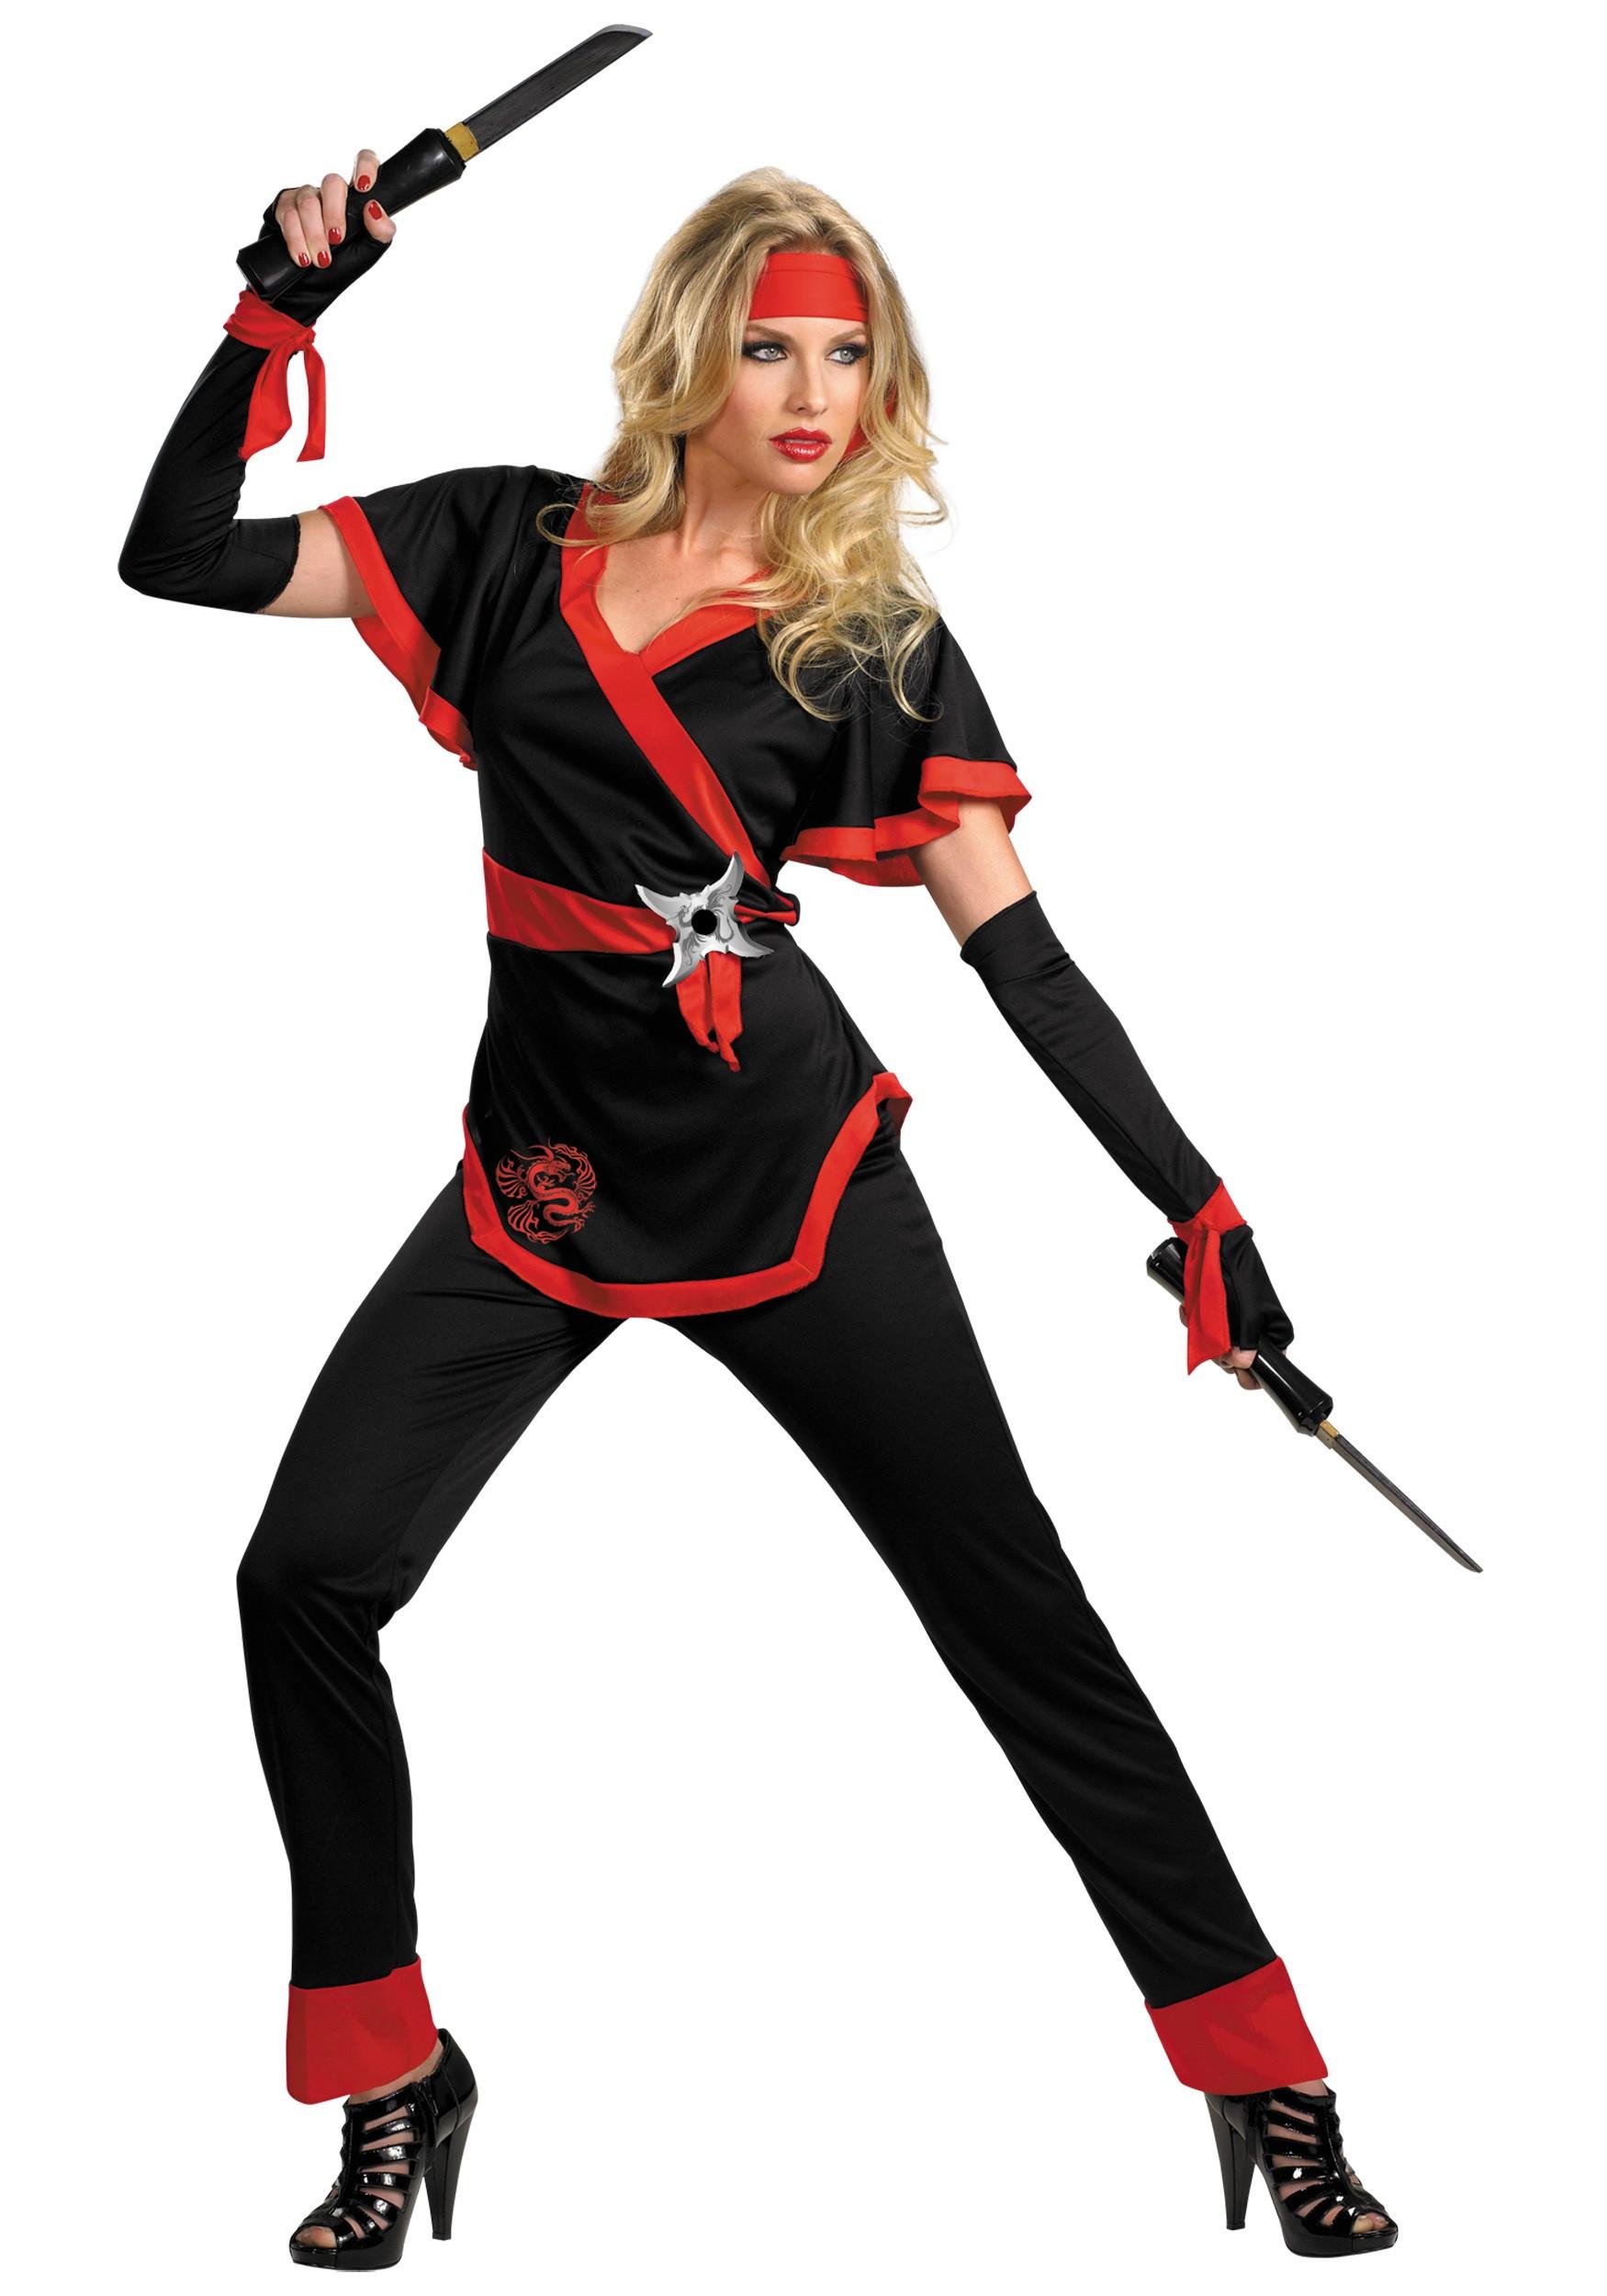 Female Ninja Costume DIY  Dragon Lady Ninja Costume